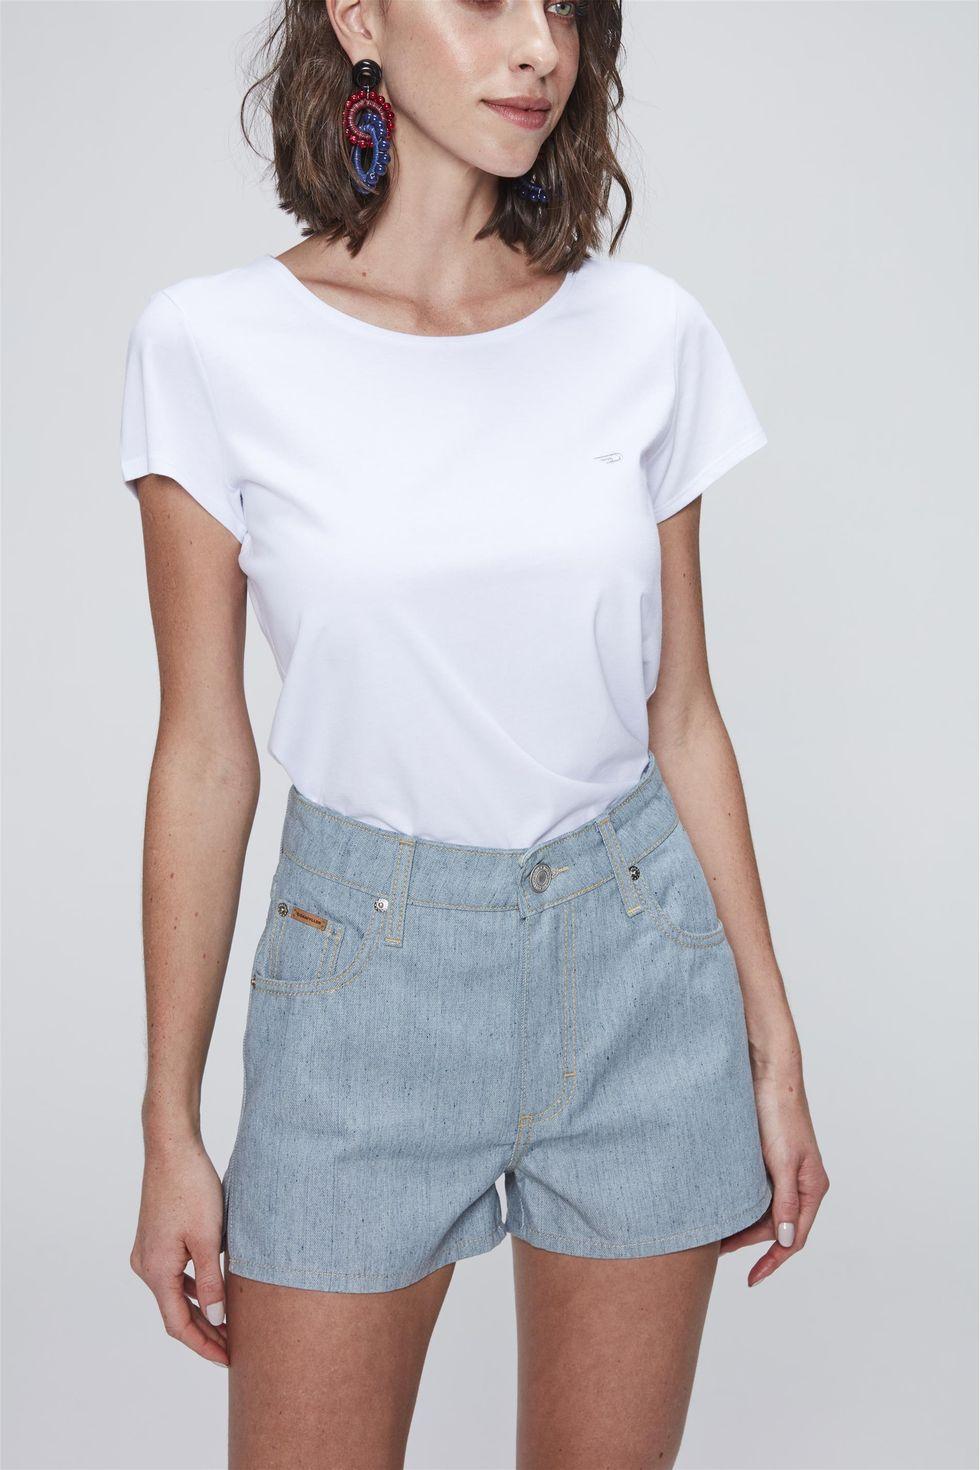 Short-Jeans-Solto-Feminino-Ecodamyller-Frente--